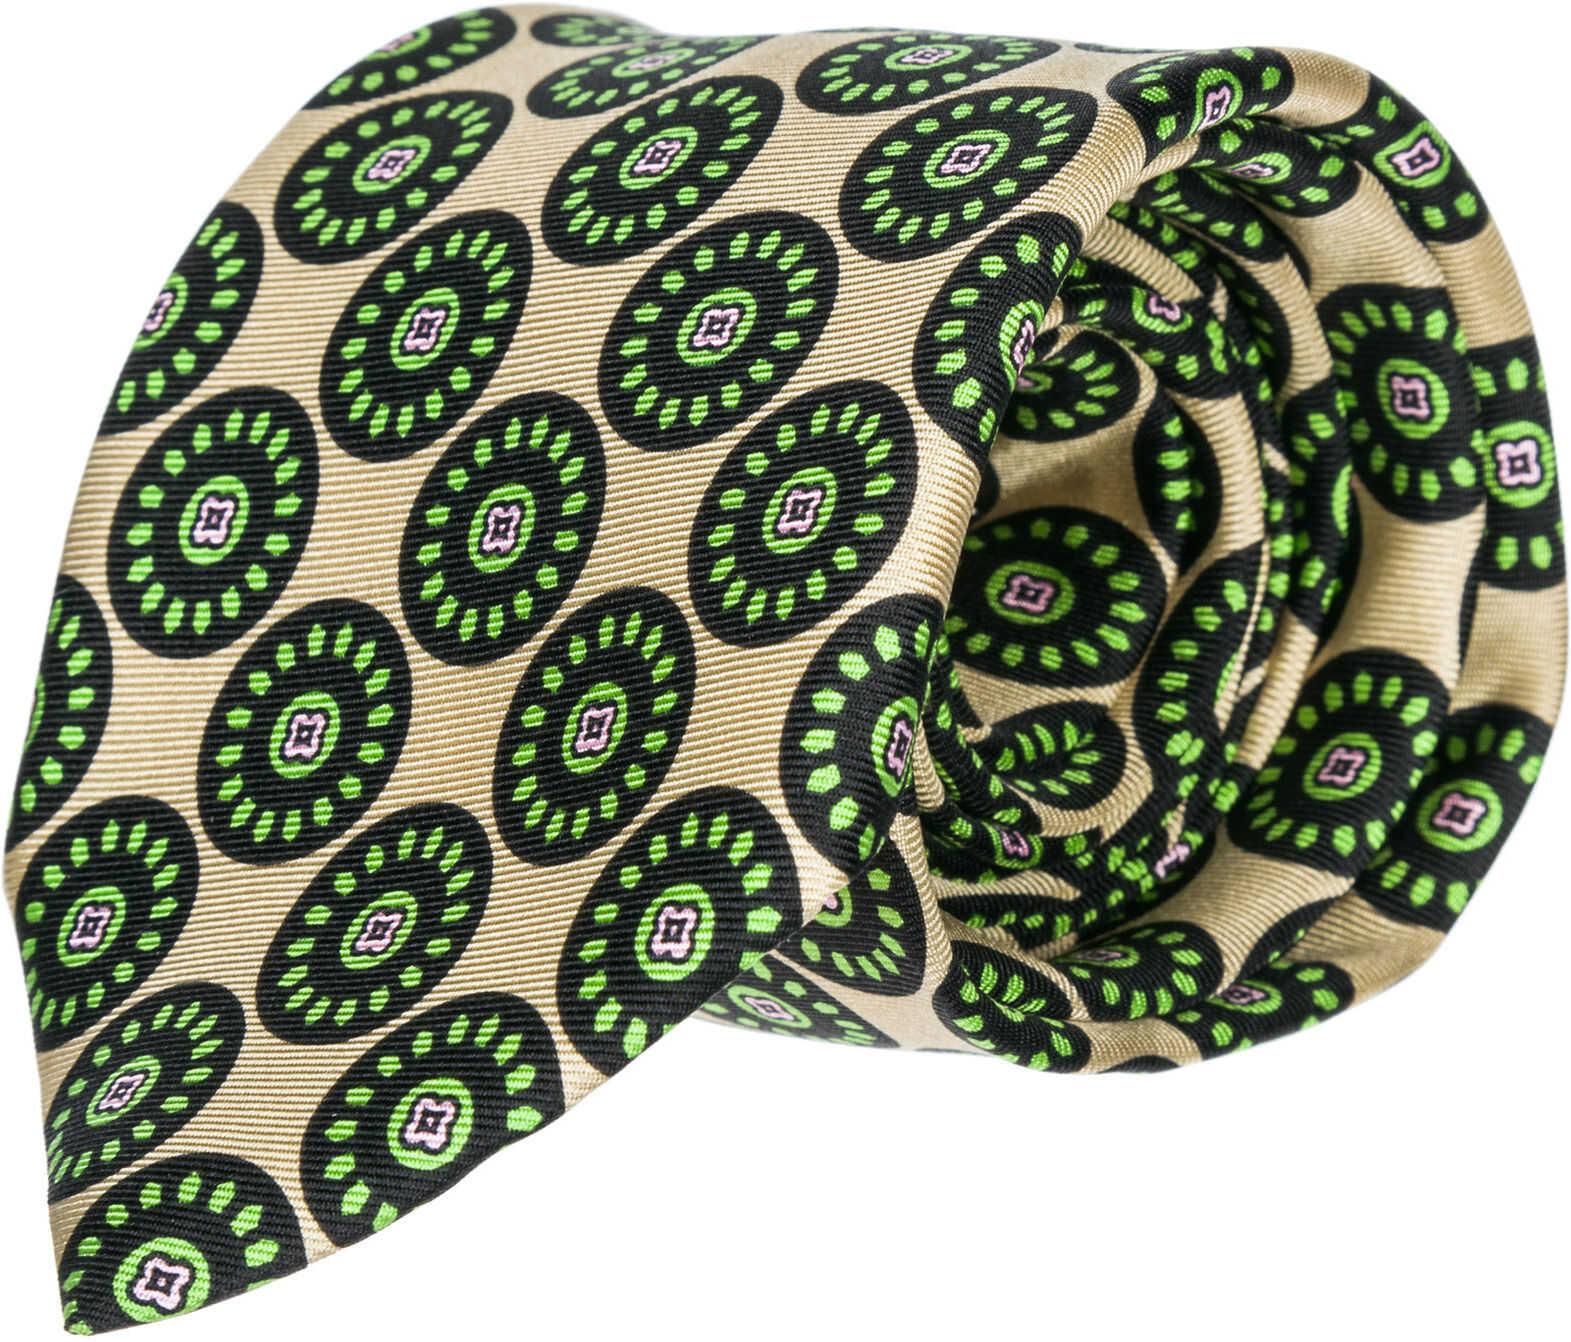 Prada Tie Necktie Green